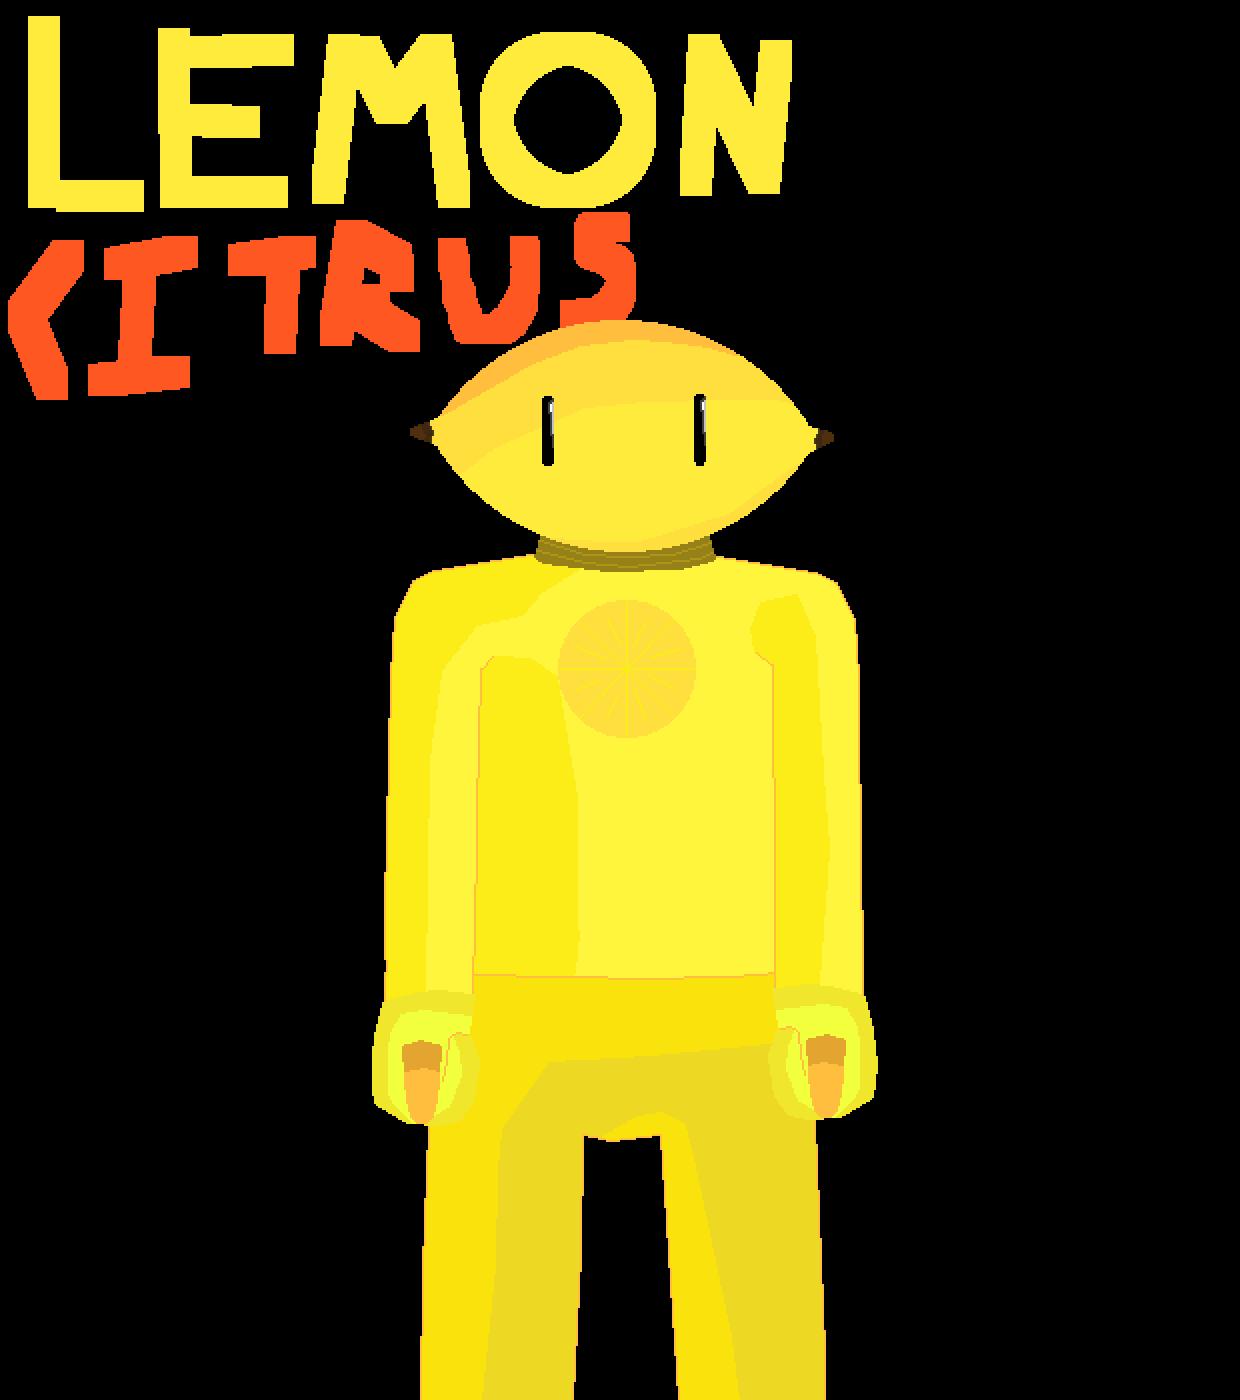 Lemoncitrus